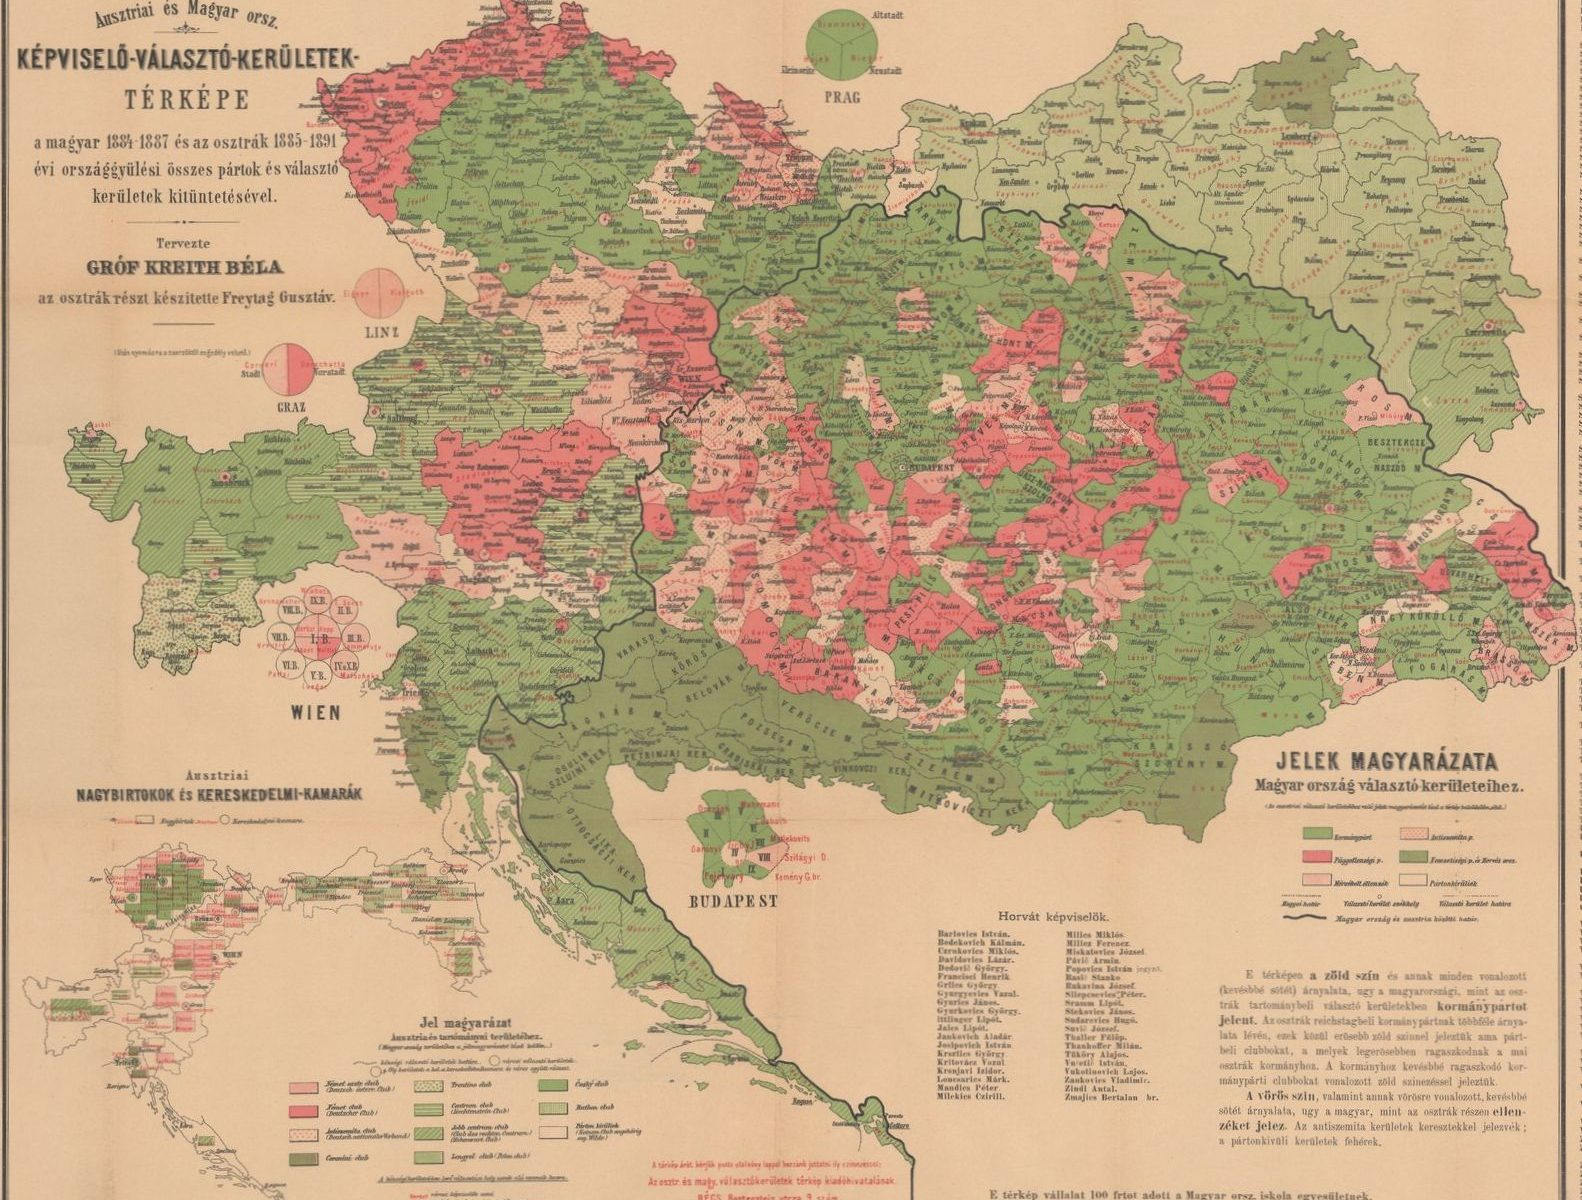 Rakúsko-Uhorská monarchia